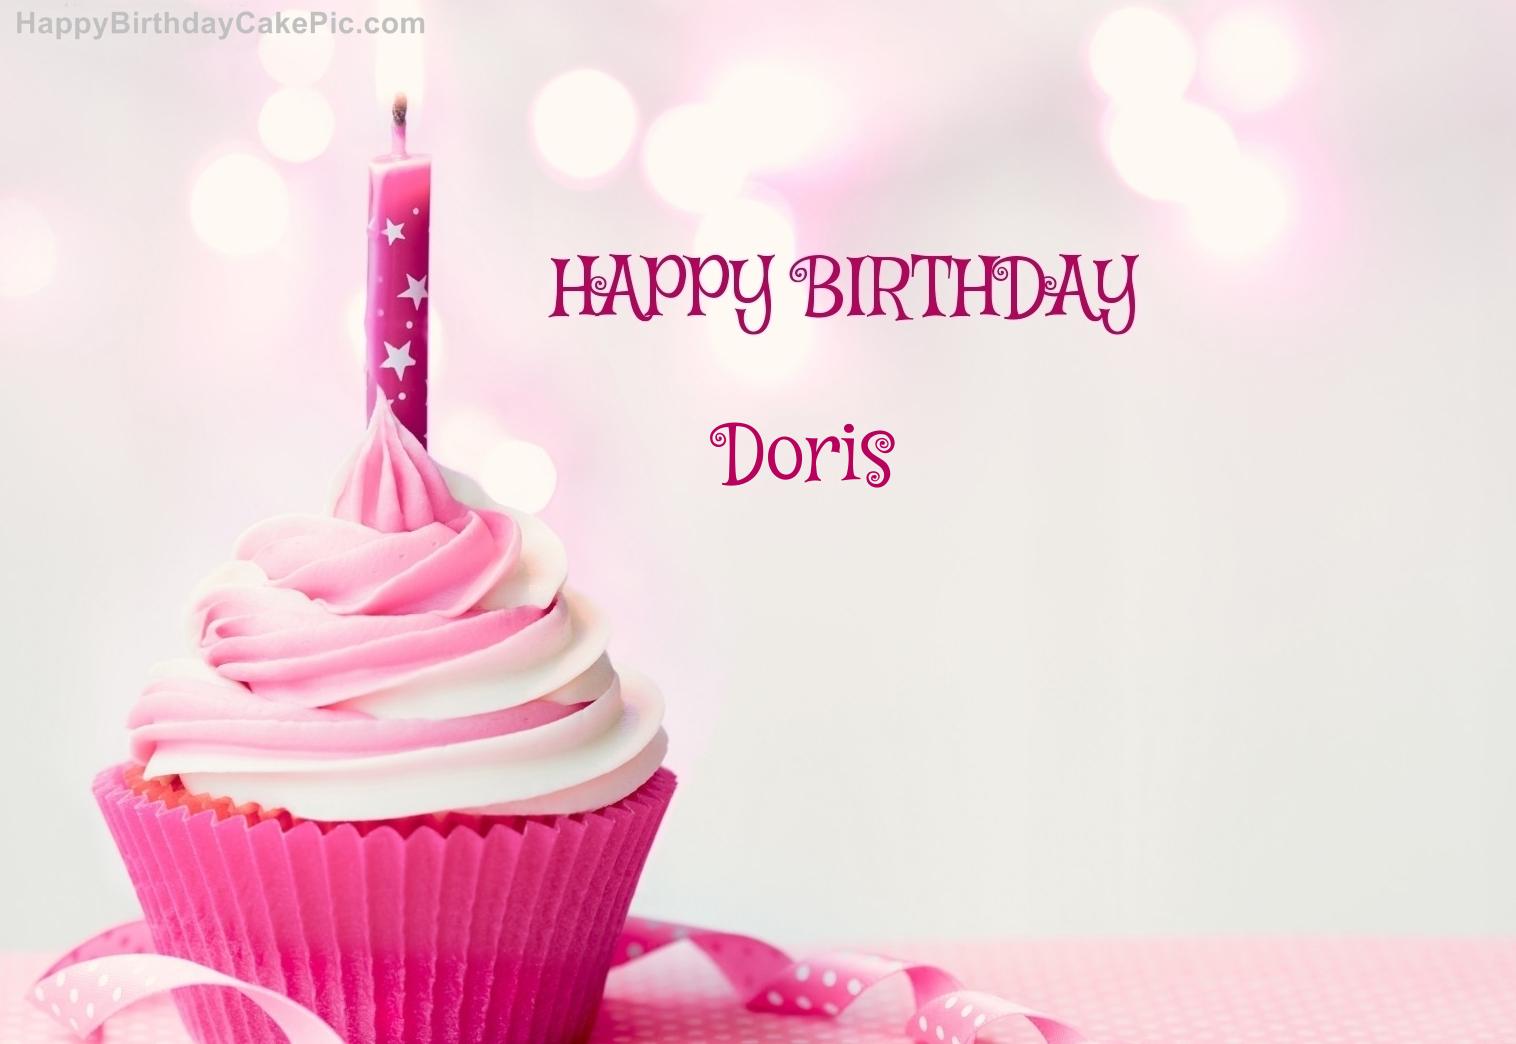 Happy Birthday Cupcake Candle Pink Cake For Doris